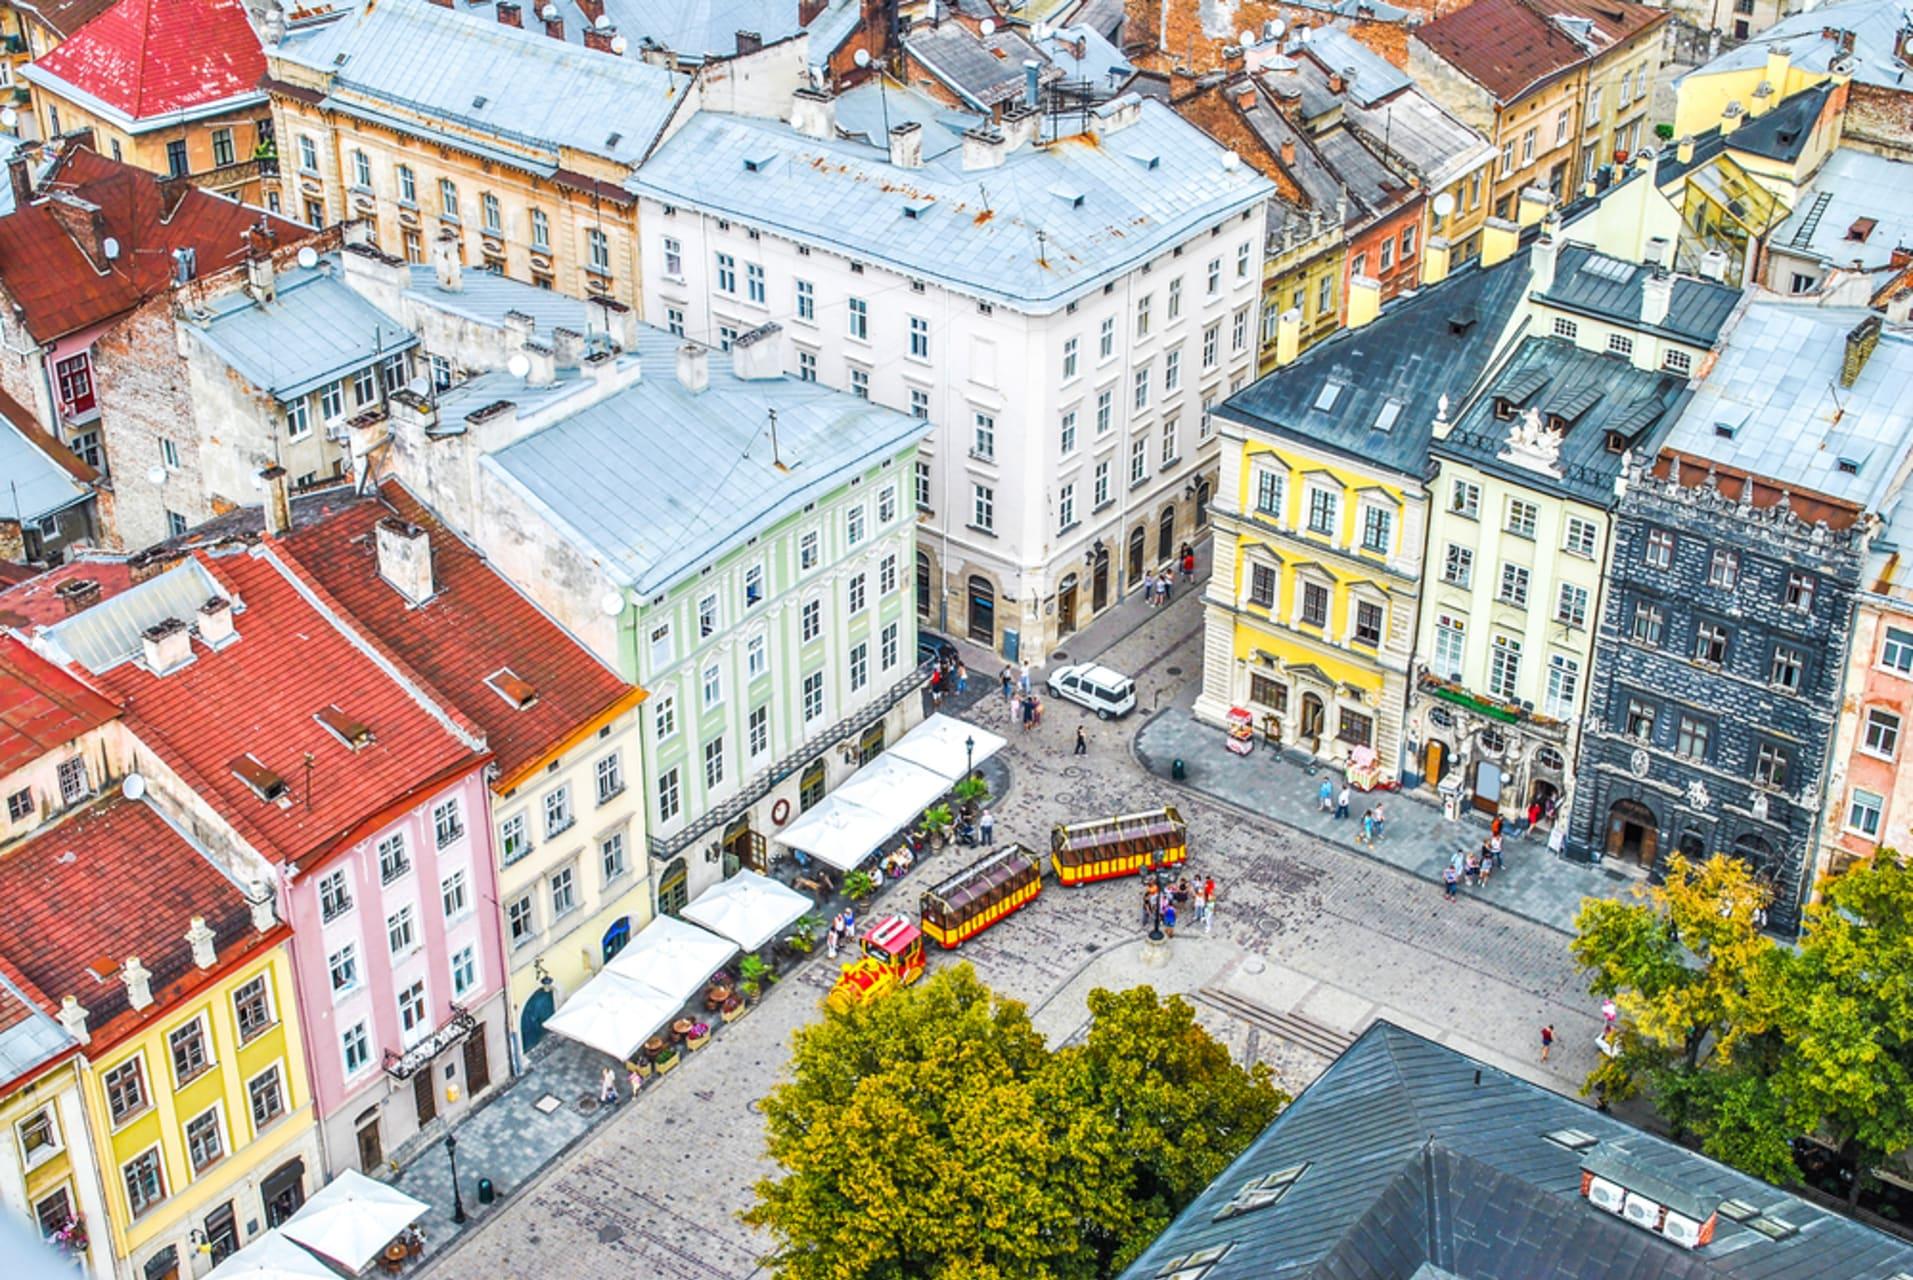 Lviv - Lviv - The Hidden Gem of Eastern Europe